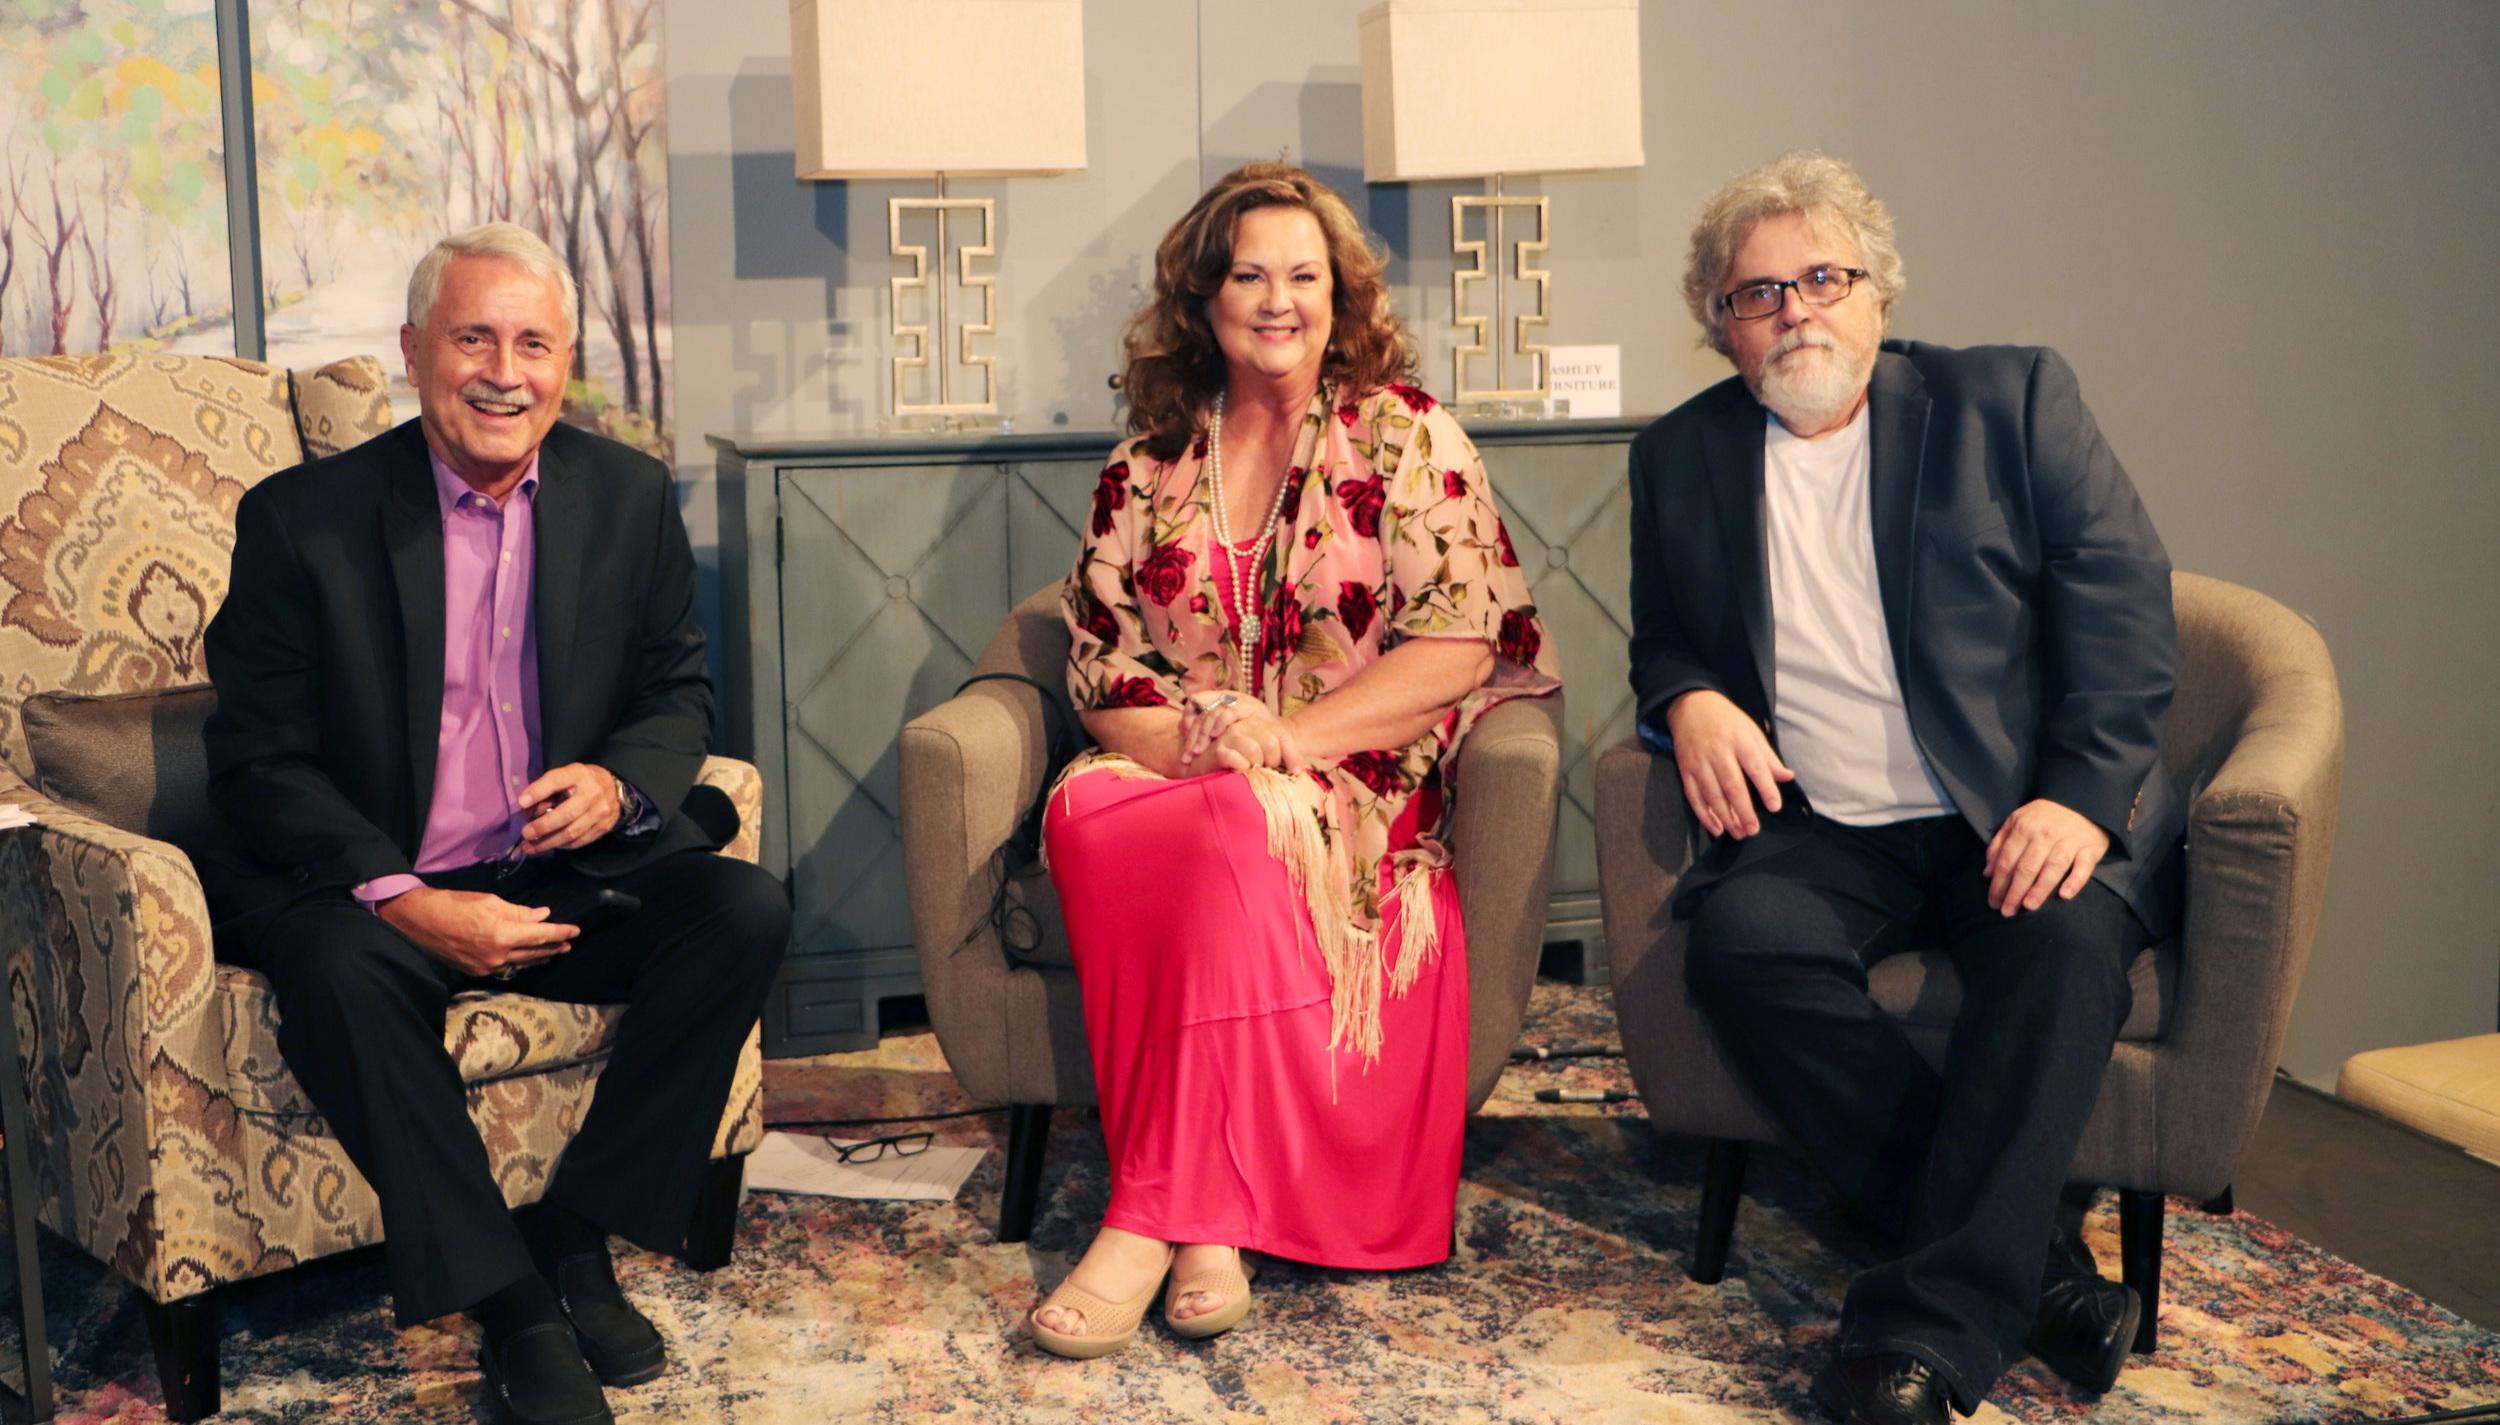 Tom Britt, Julie Cooke & Keith Sherley